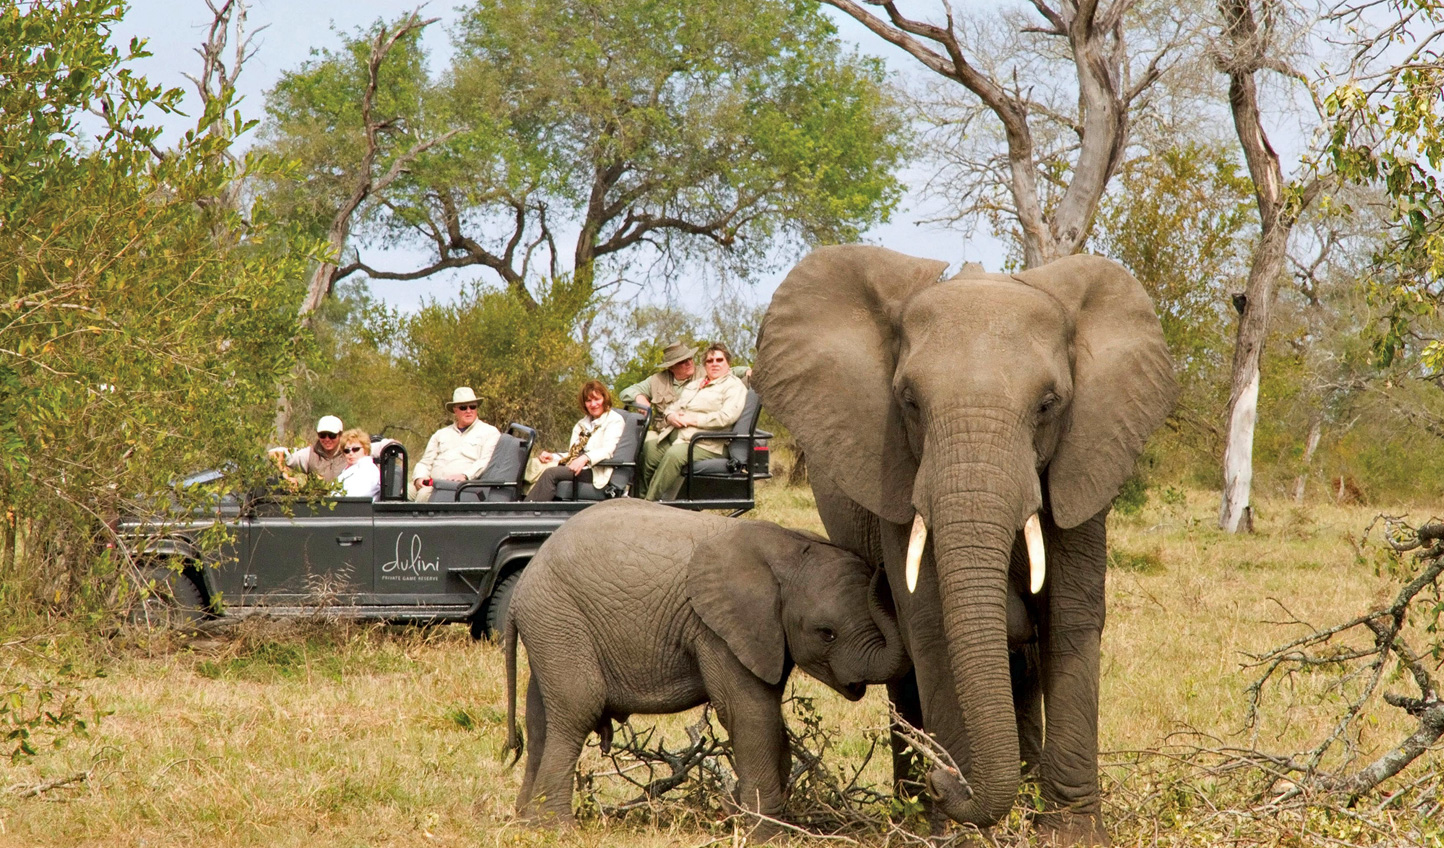 Elephants, lions, zebras, leopards, monkeys, and more